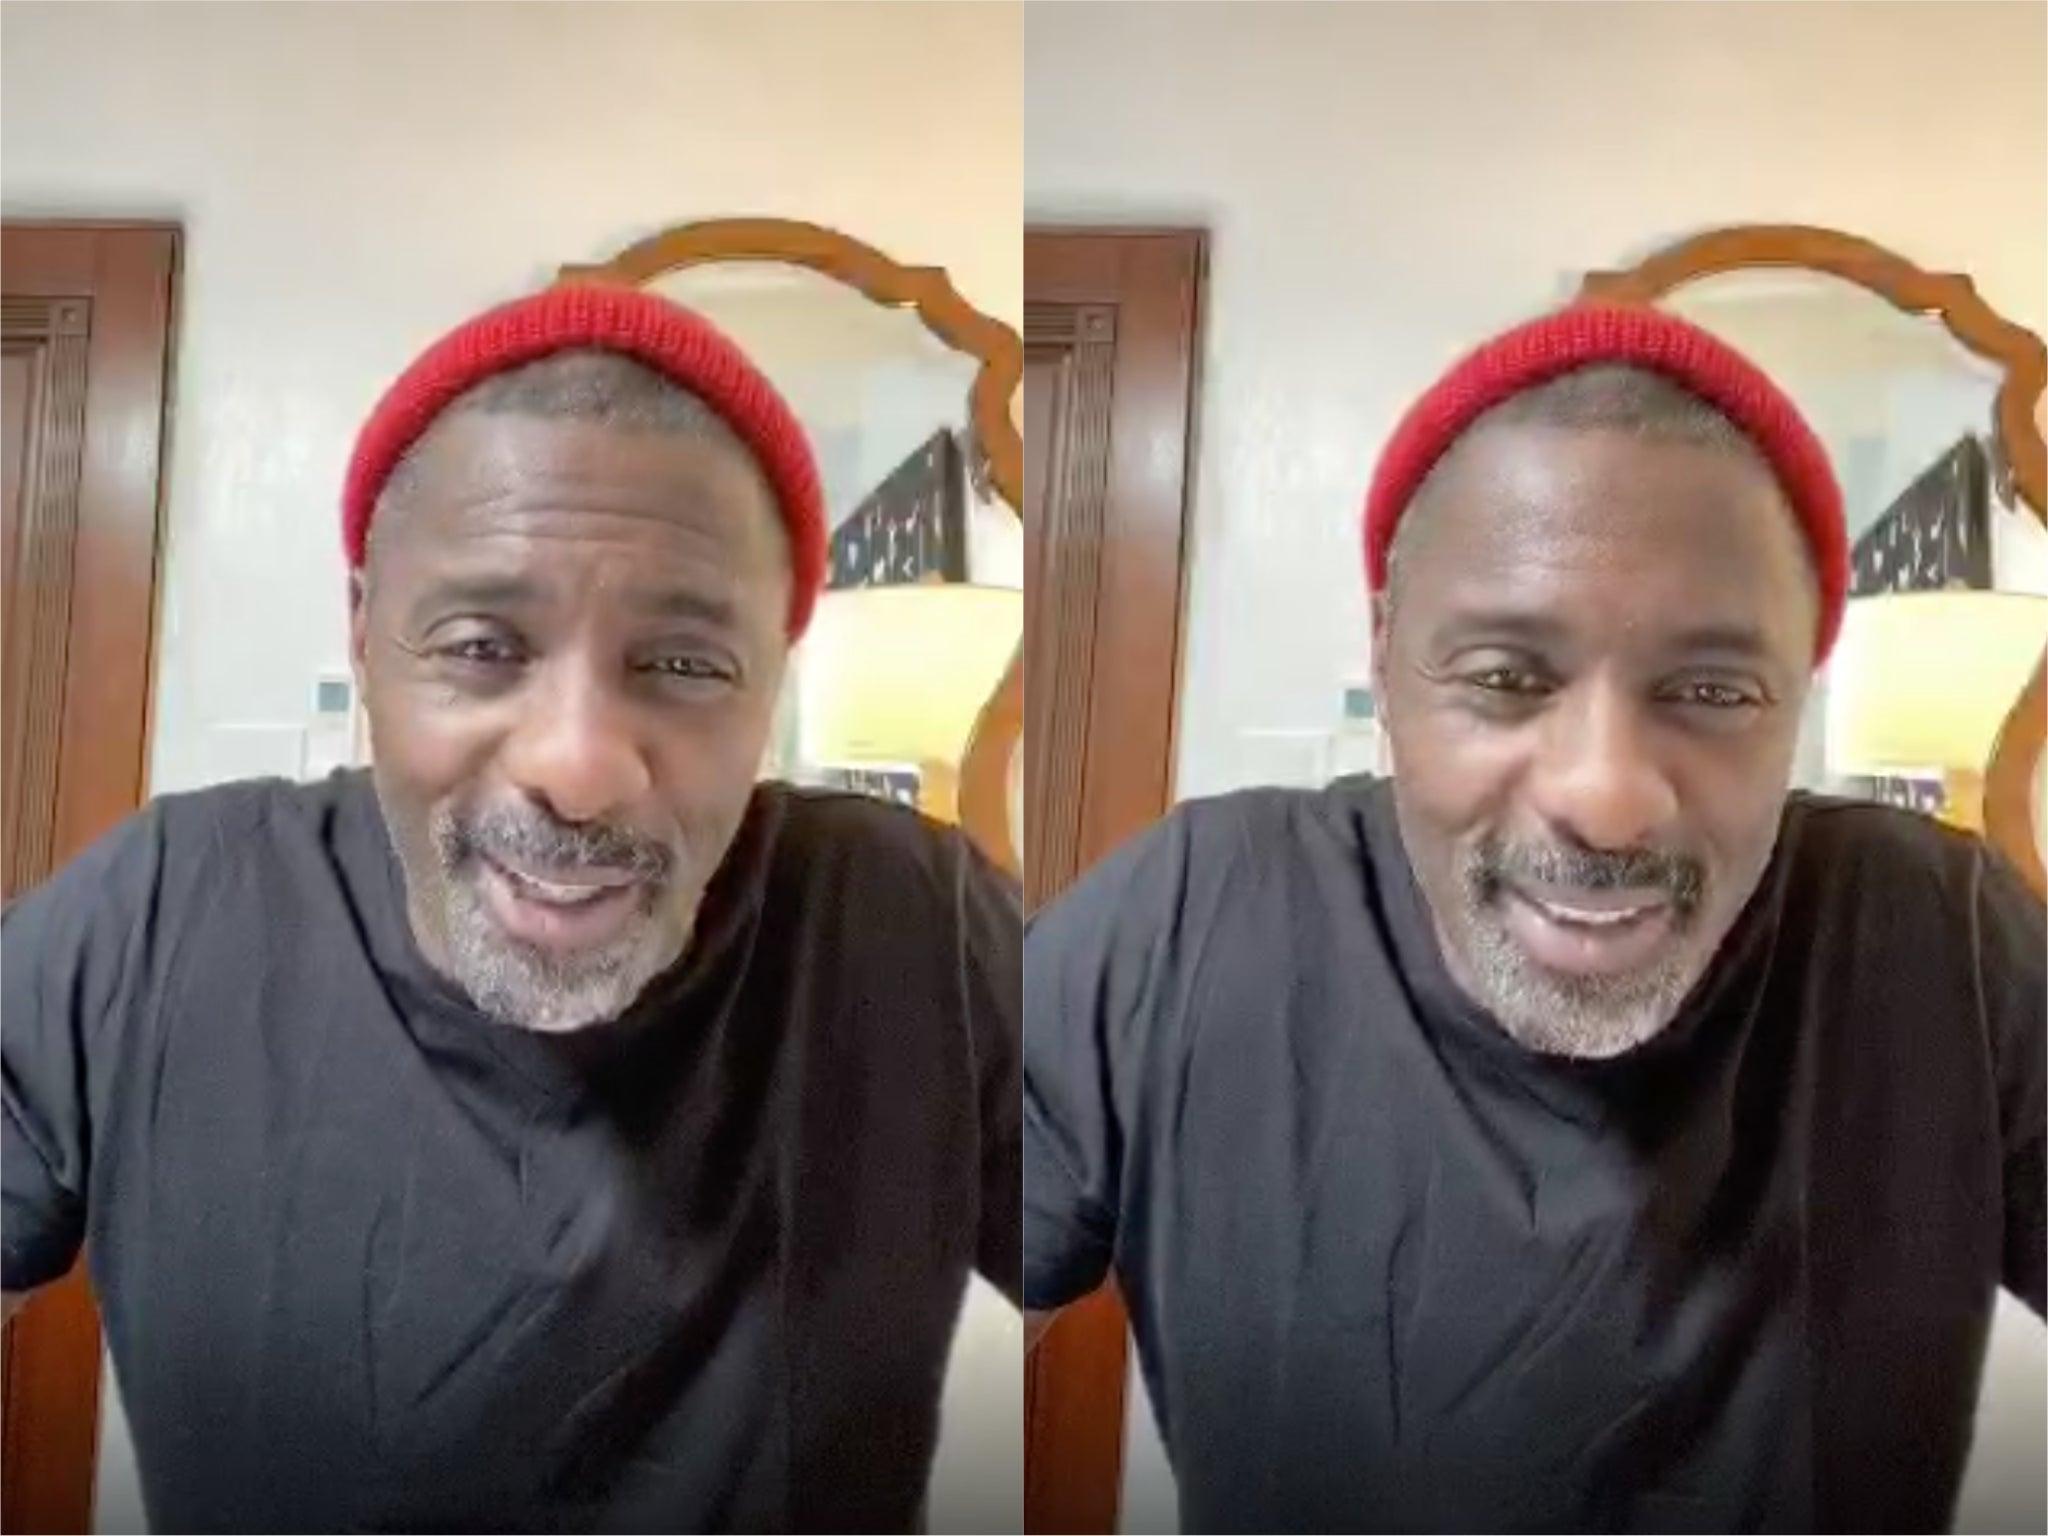 Coronavirus: Idris Elba says his asthma puts him in 'high risk' category